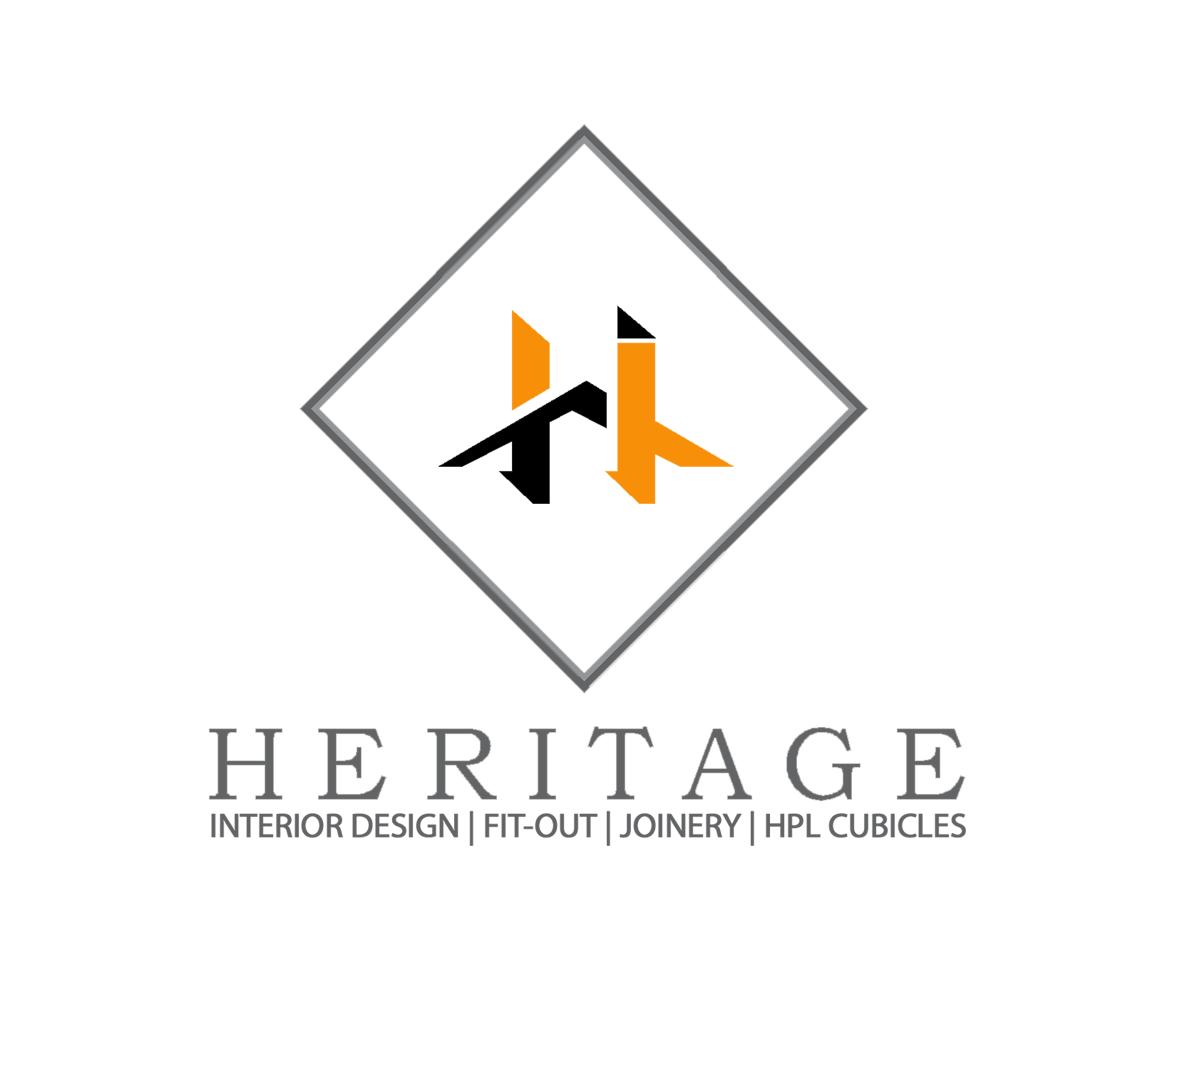 هيريتيج إنتريورز Heritage Interiors